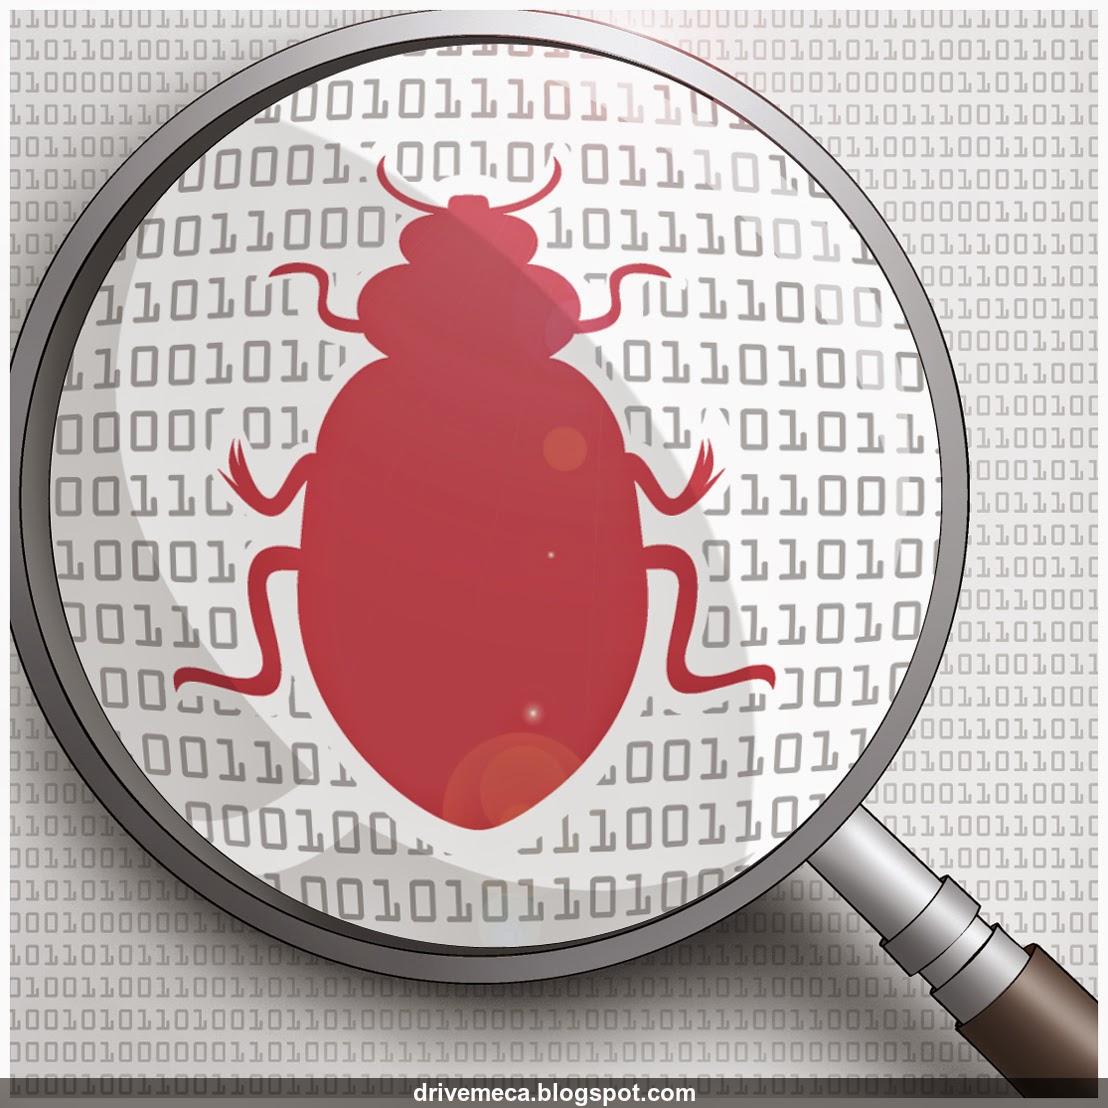 DriveMeca mostrando como corregir el bug Ghost de glibc